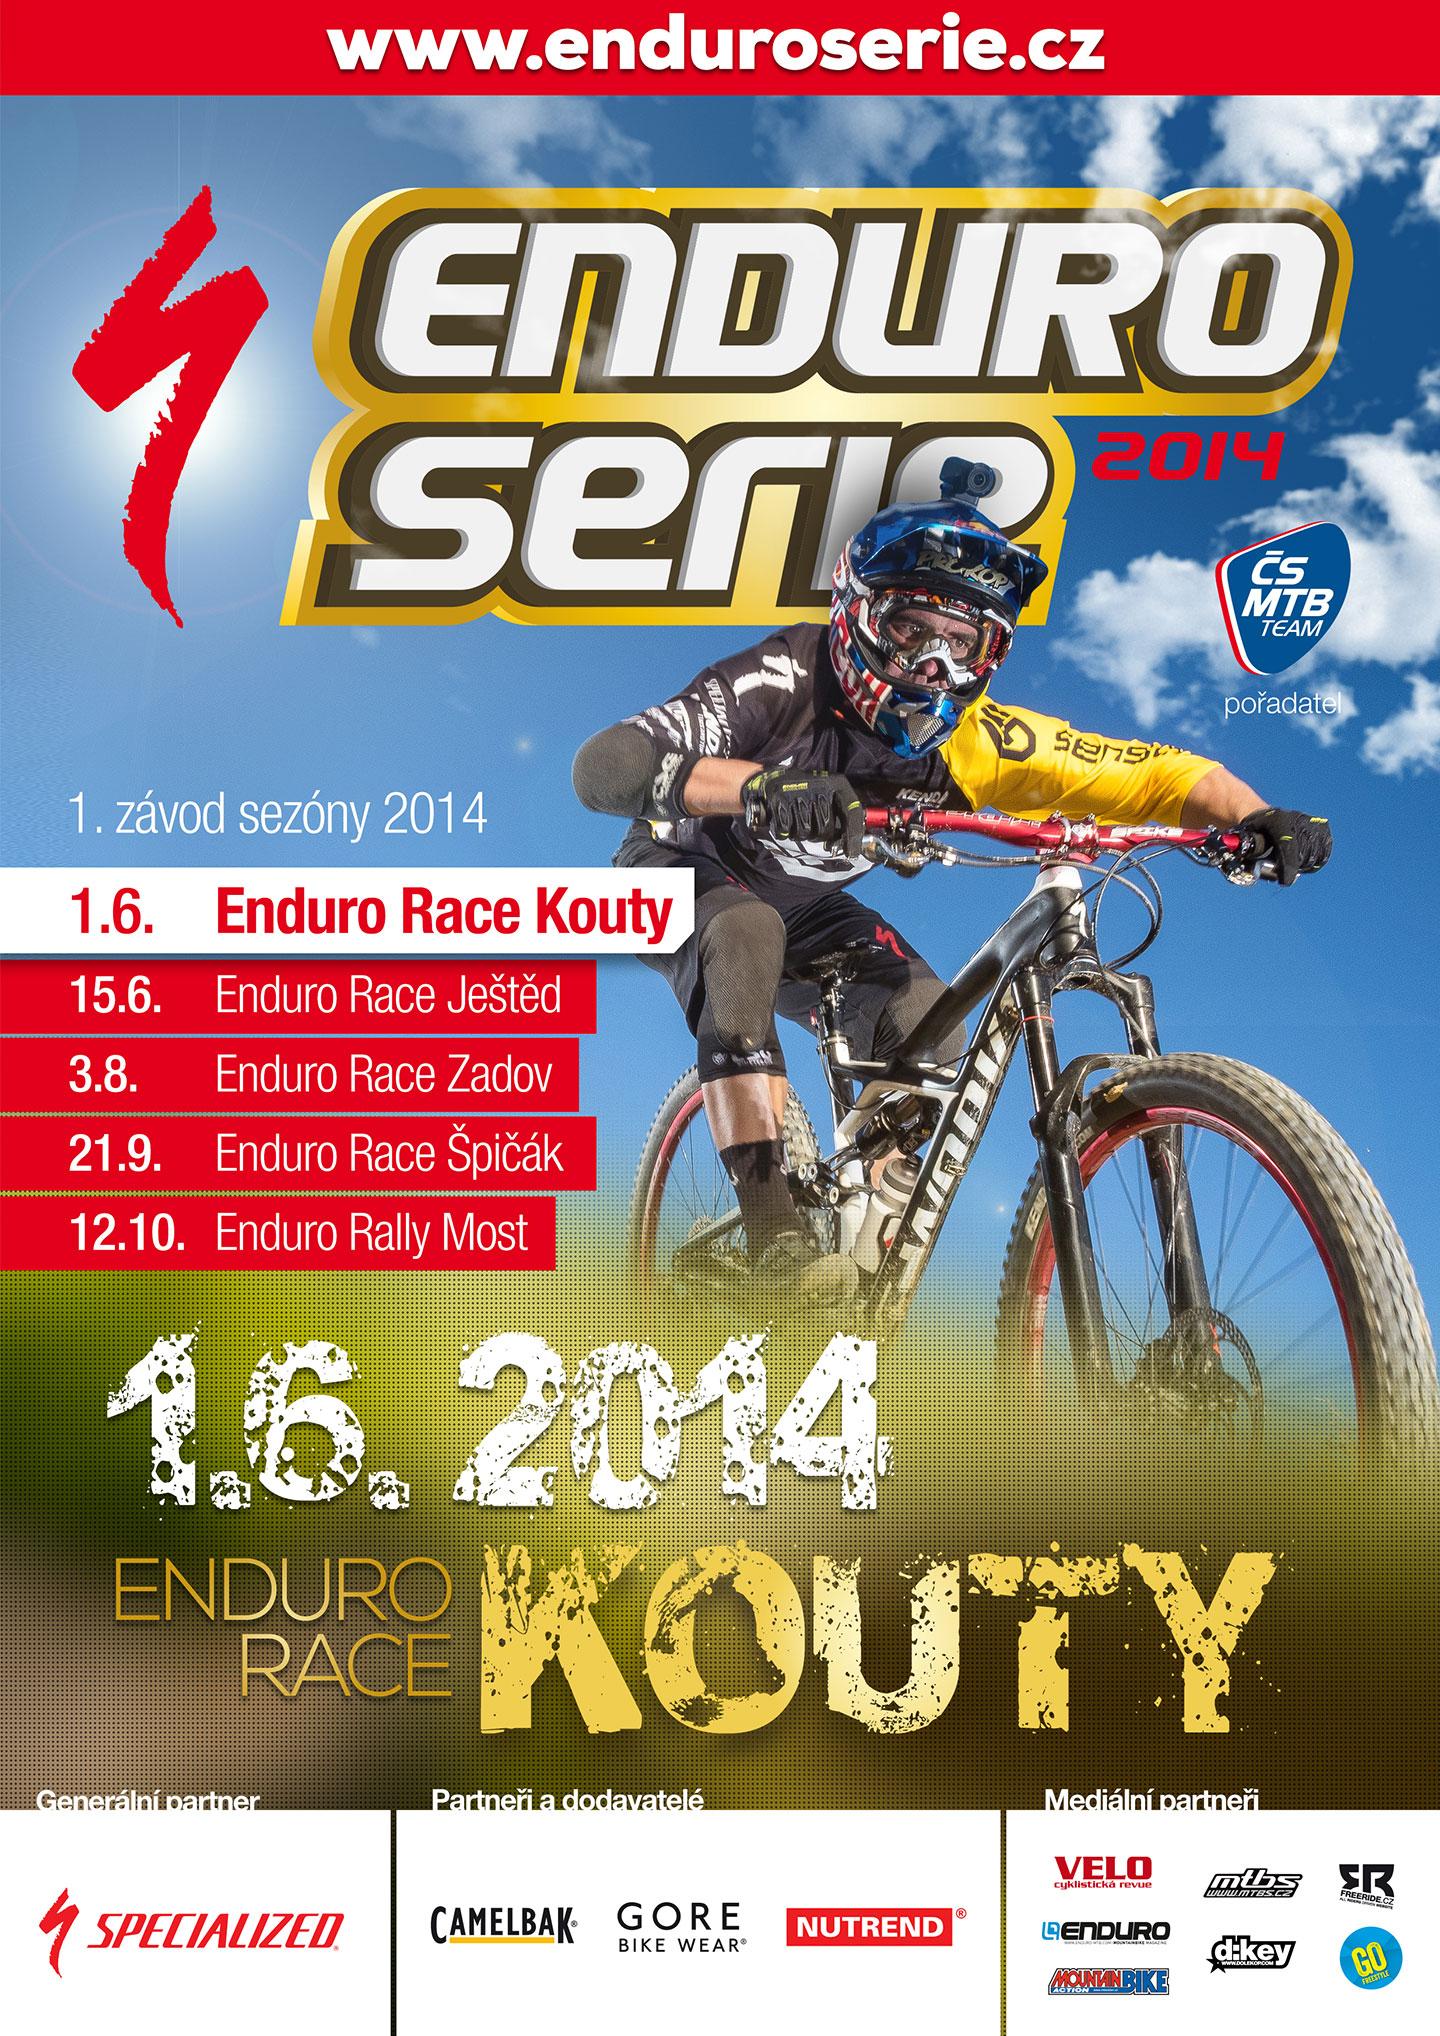 Enduro Serie 2014